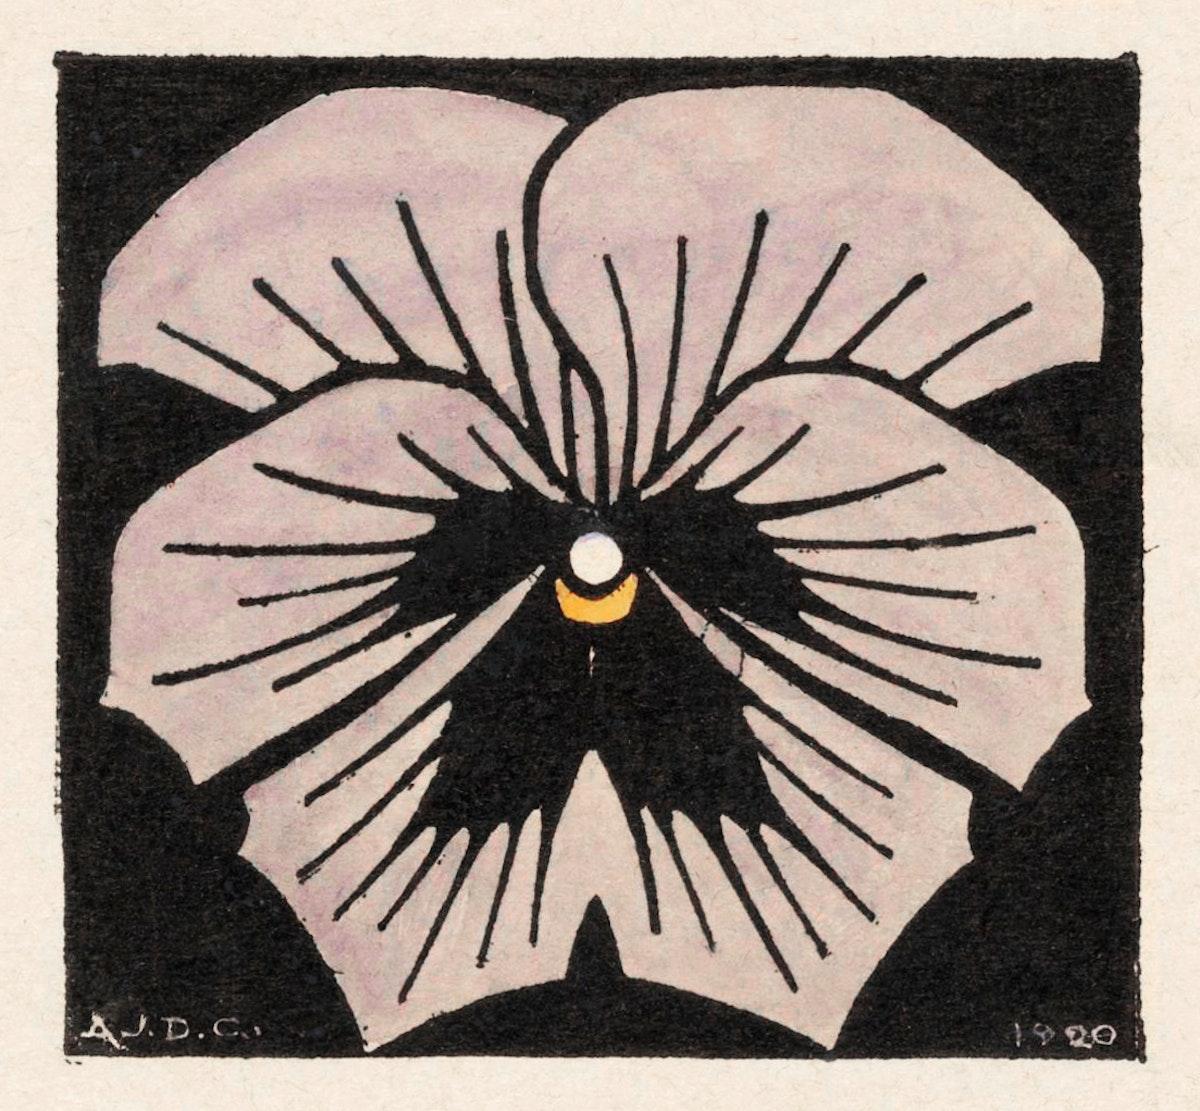 Woodcut flower (1920) by Julie de Graag (1877-1924). Original from The Rijksmuseum. Digitally enhanced by rawpixel.